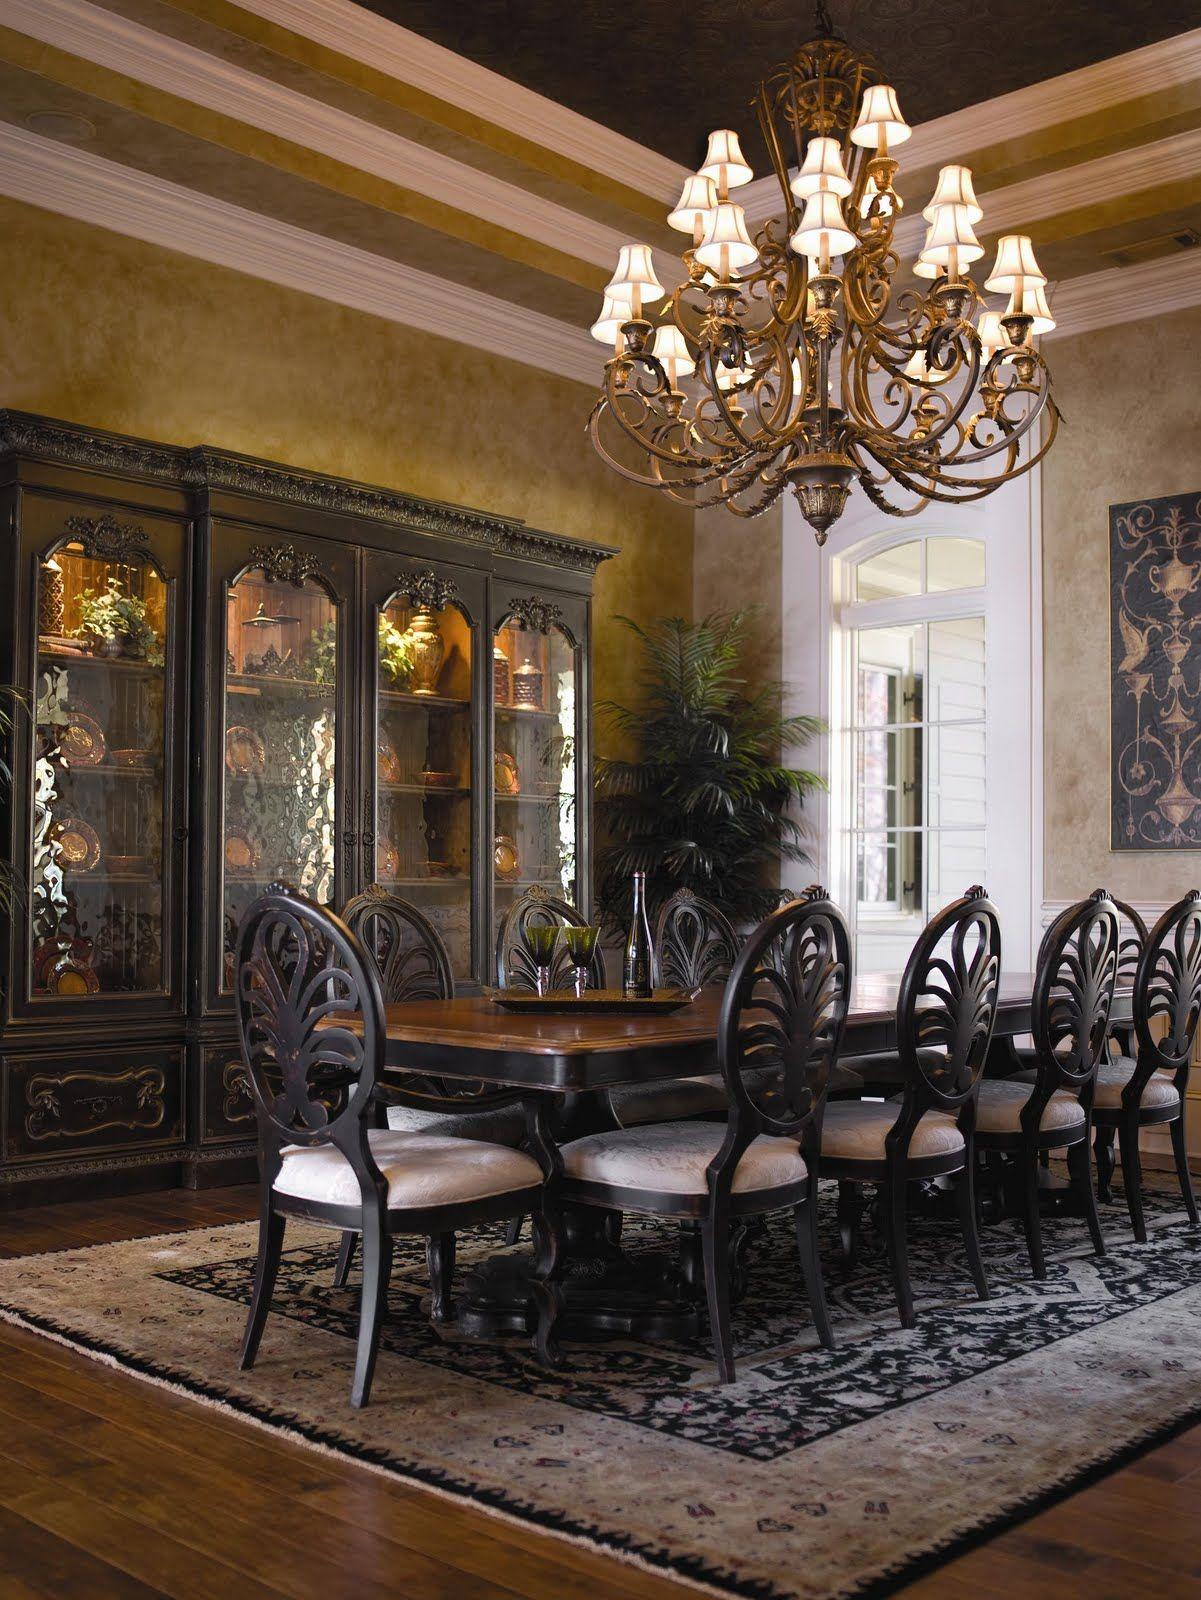 Breakfast Room Design: Luxury European Dining Room